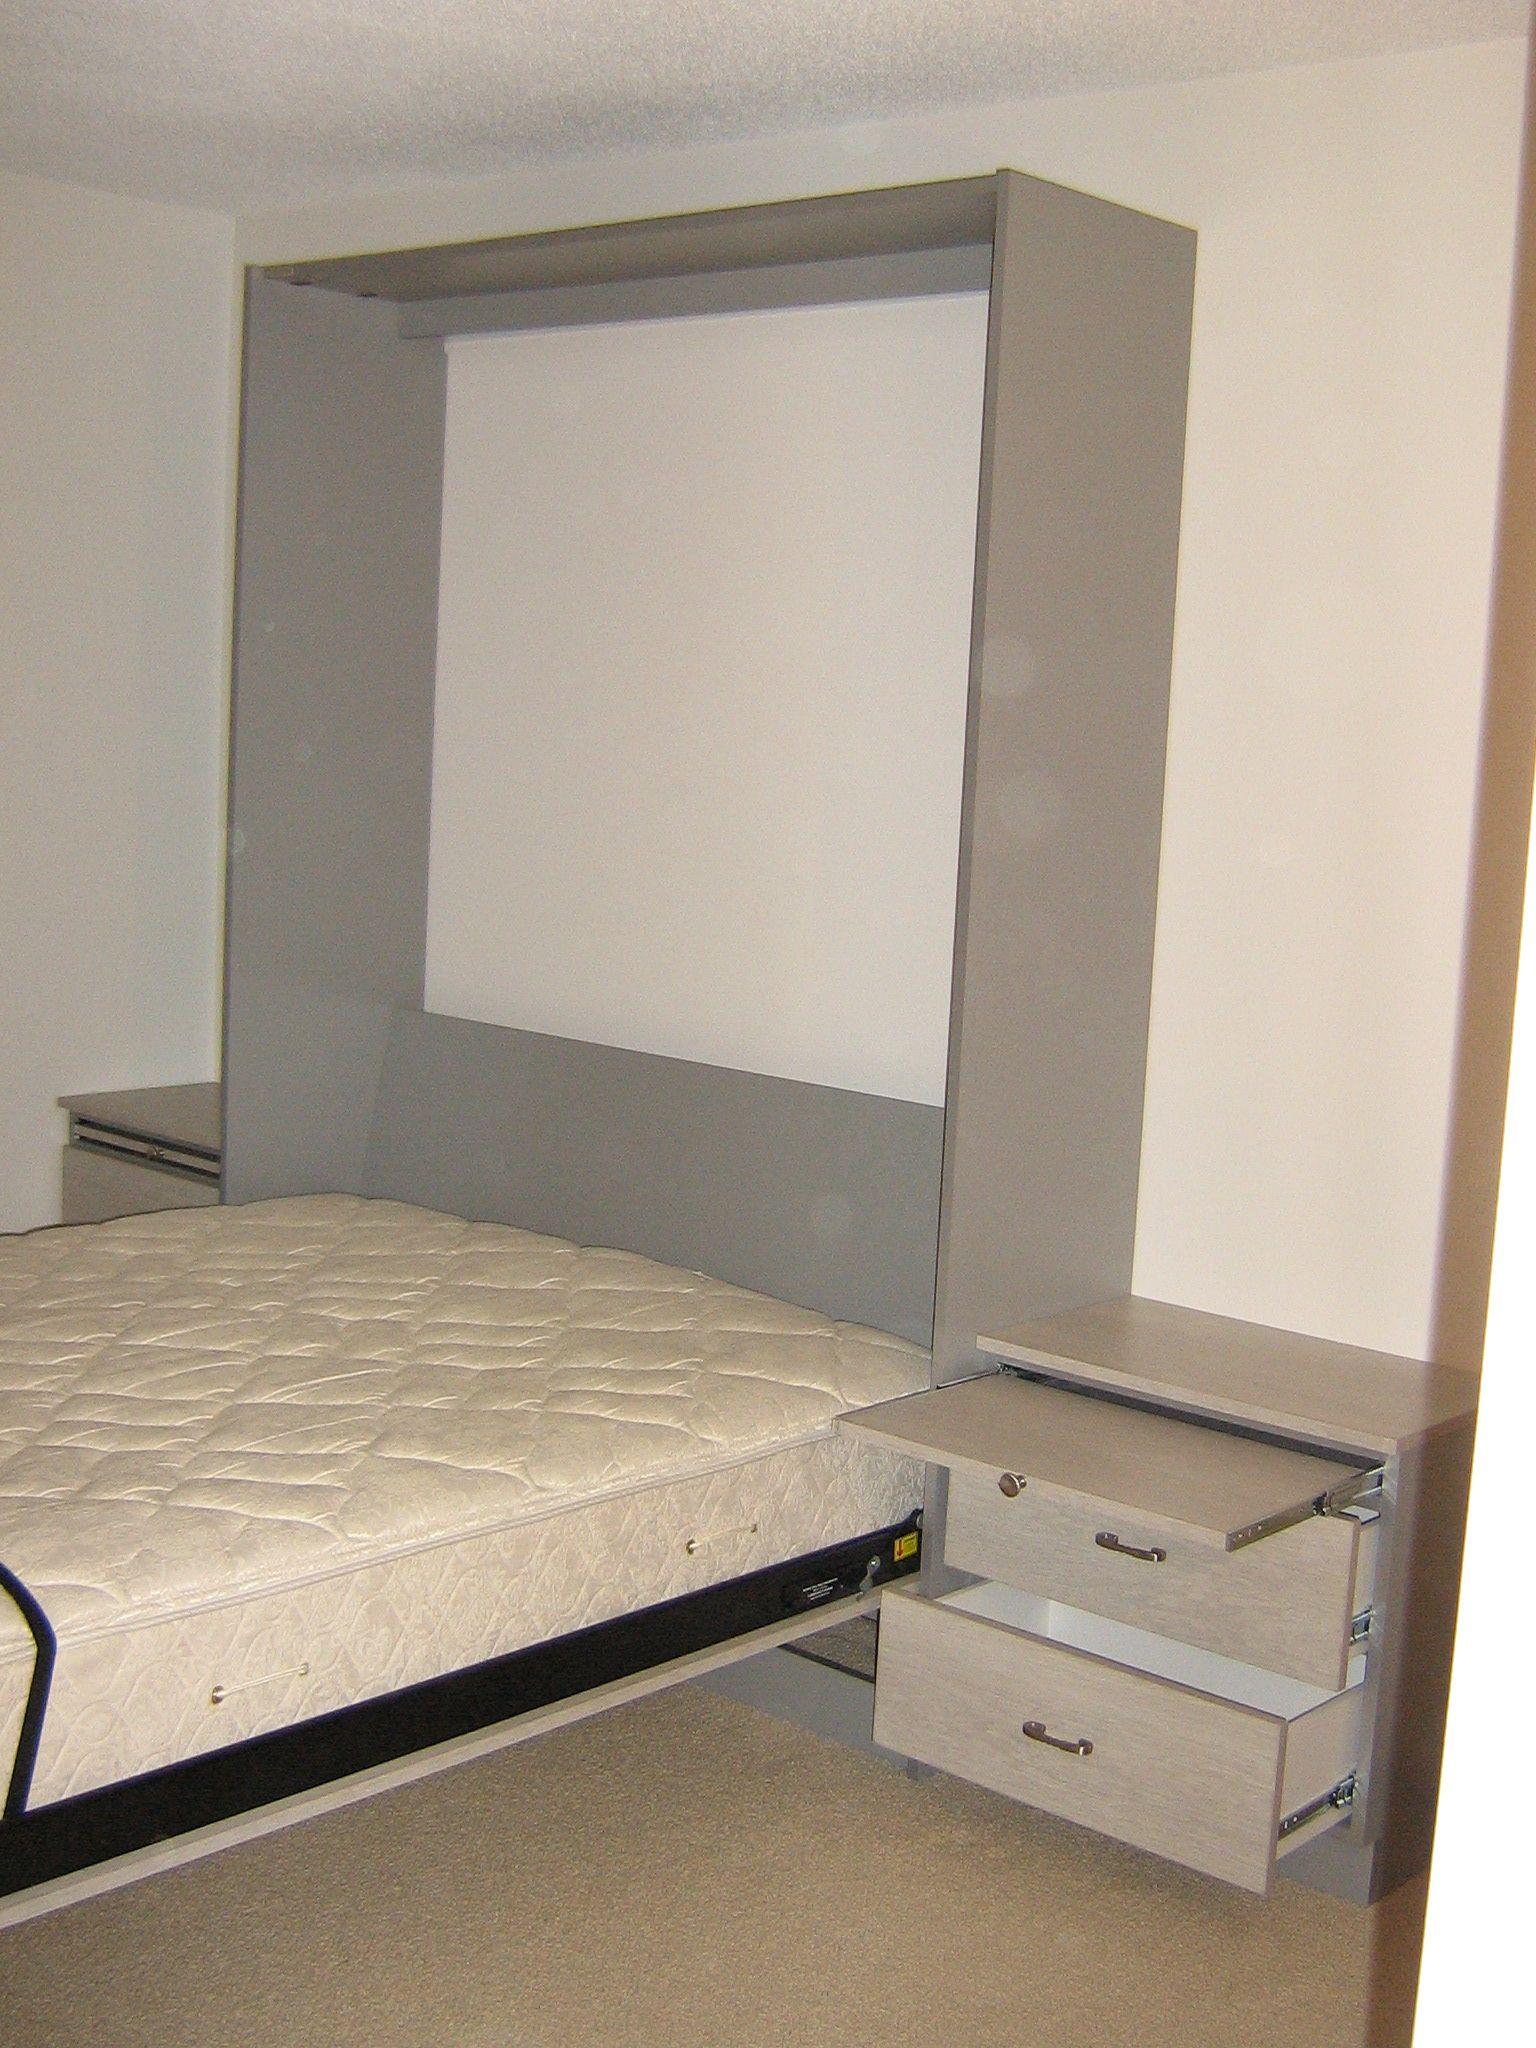 Wall Bed, Murphy Bed, California Closets Twin Cities, MN Wall Beds, Murphy